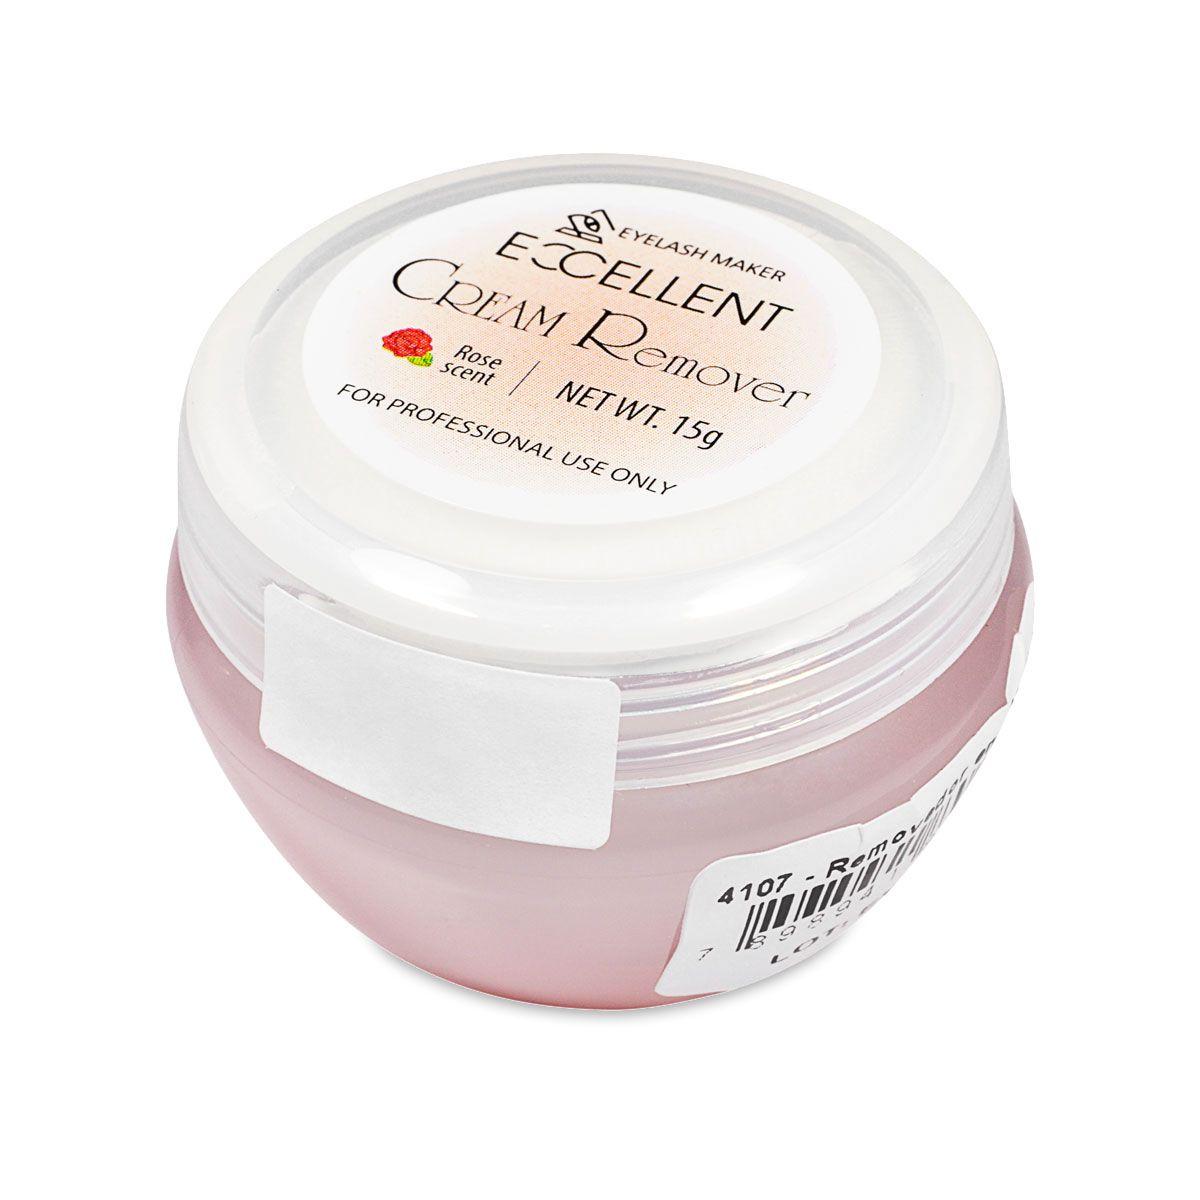 Removedor de Cola Excellent Cream Remover 15g Rose